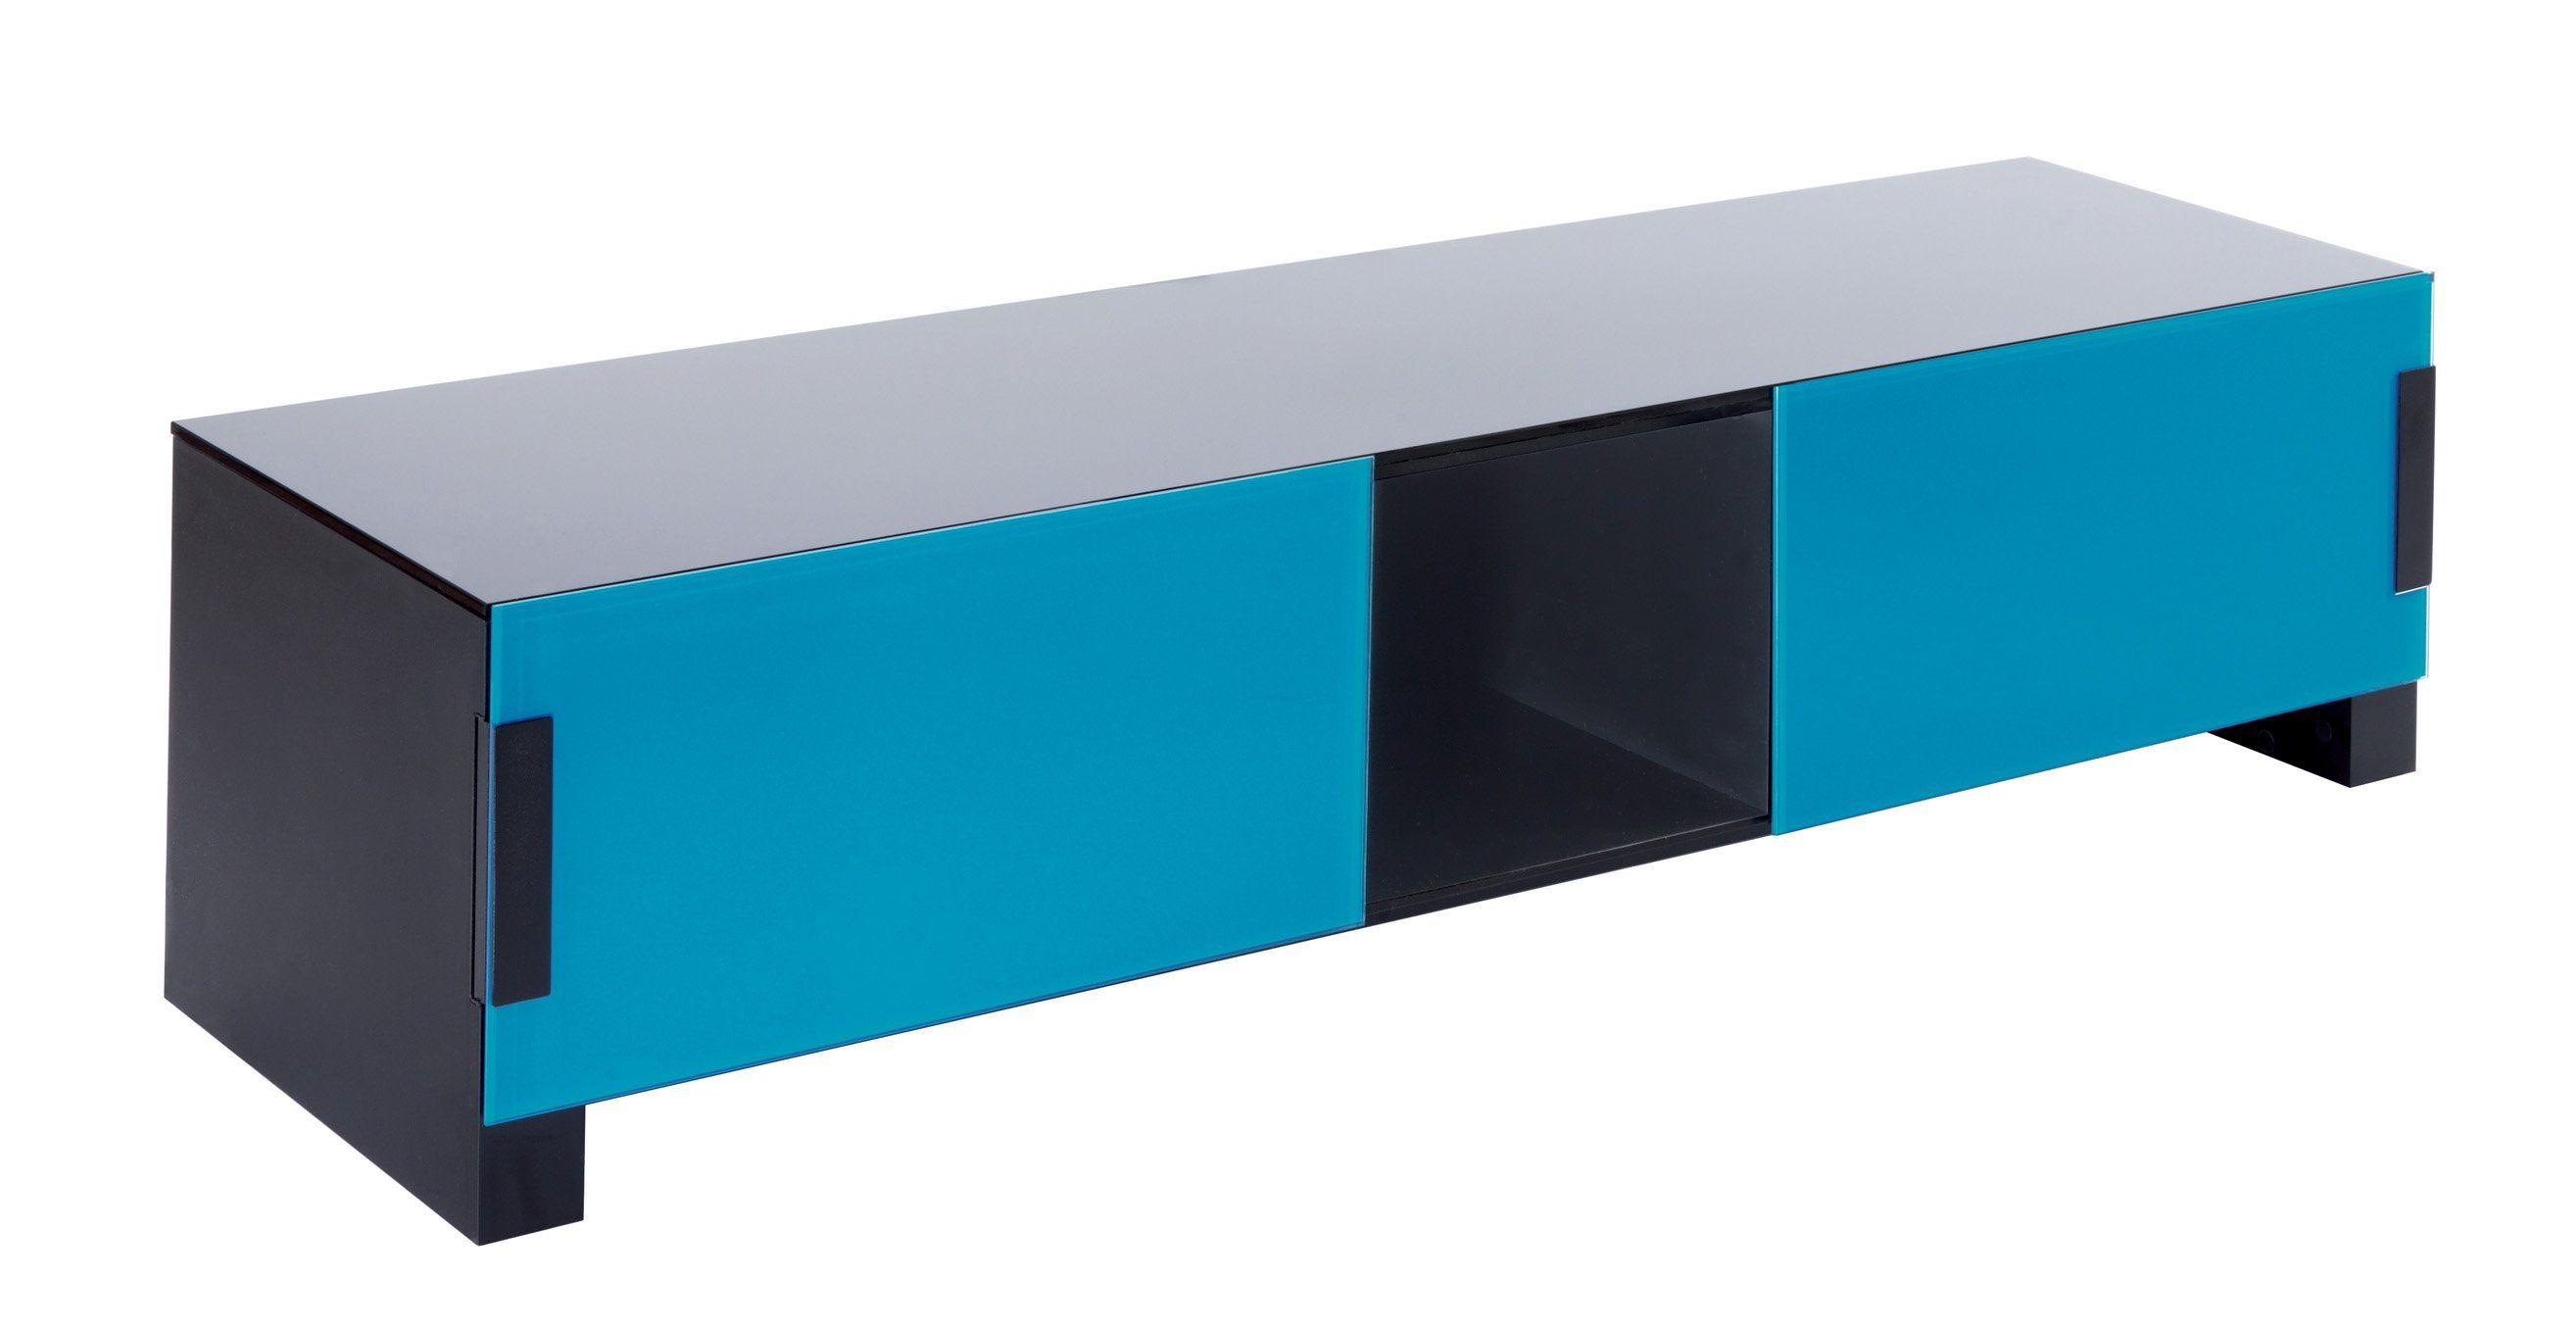 Meuble Tv Erard Bilt 1400 Bleu Mister Blue Sky Pinterest # Meuble Tv Sky Blanc